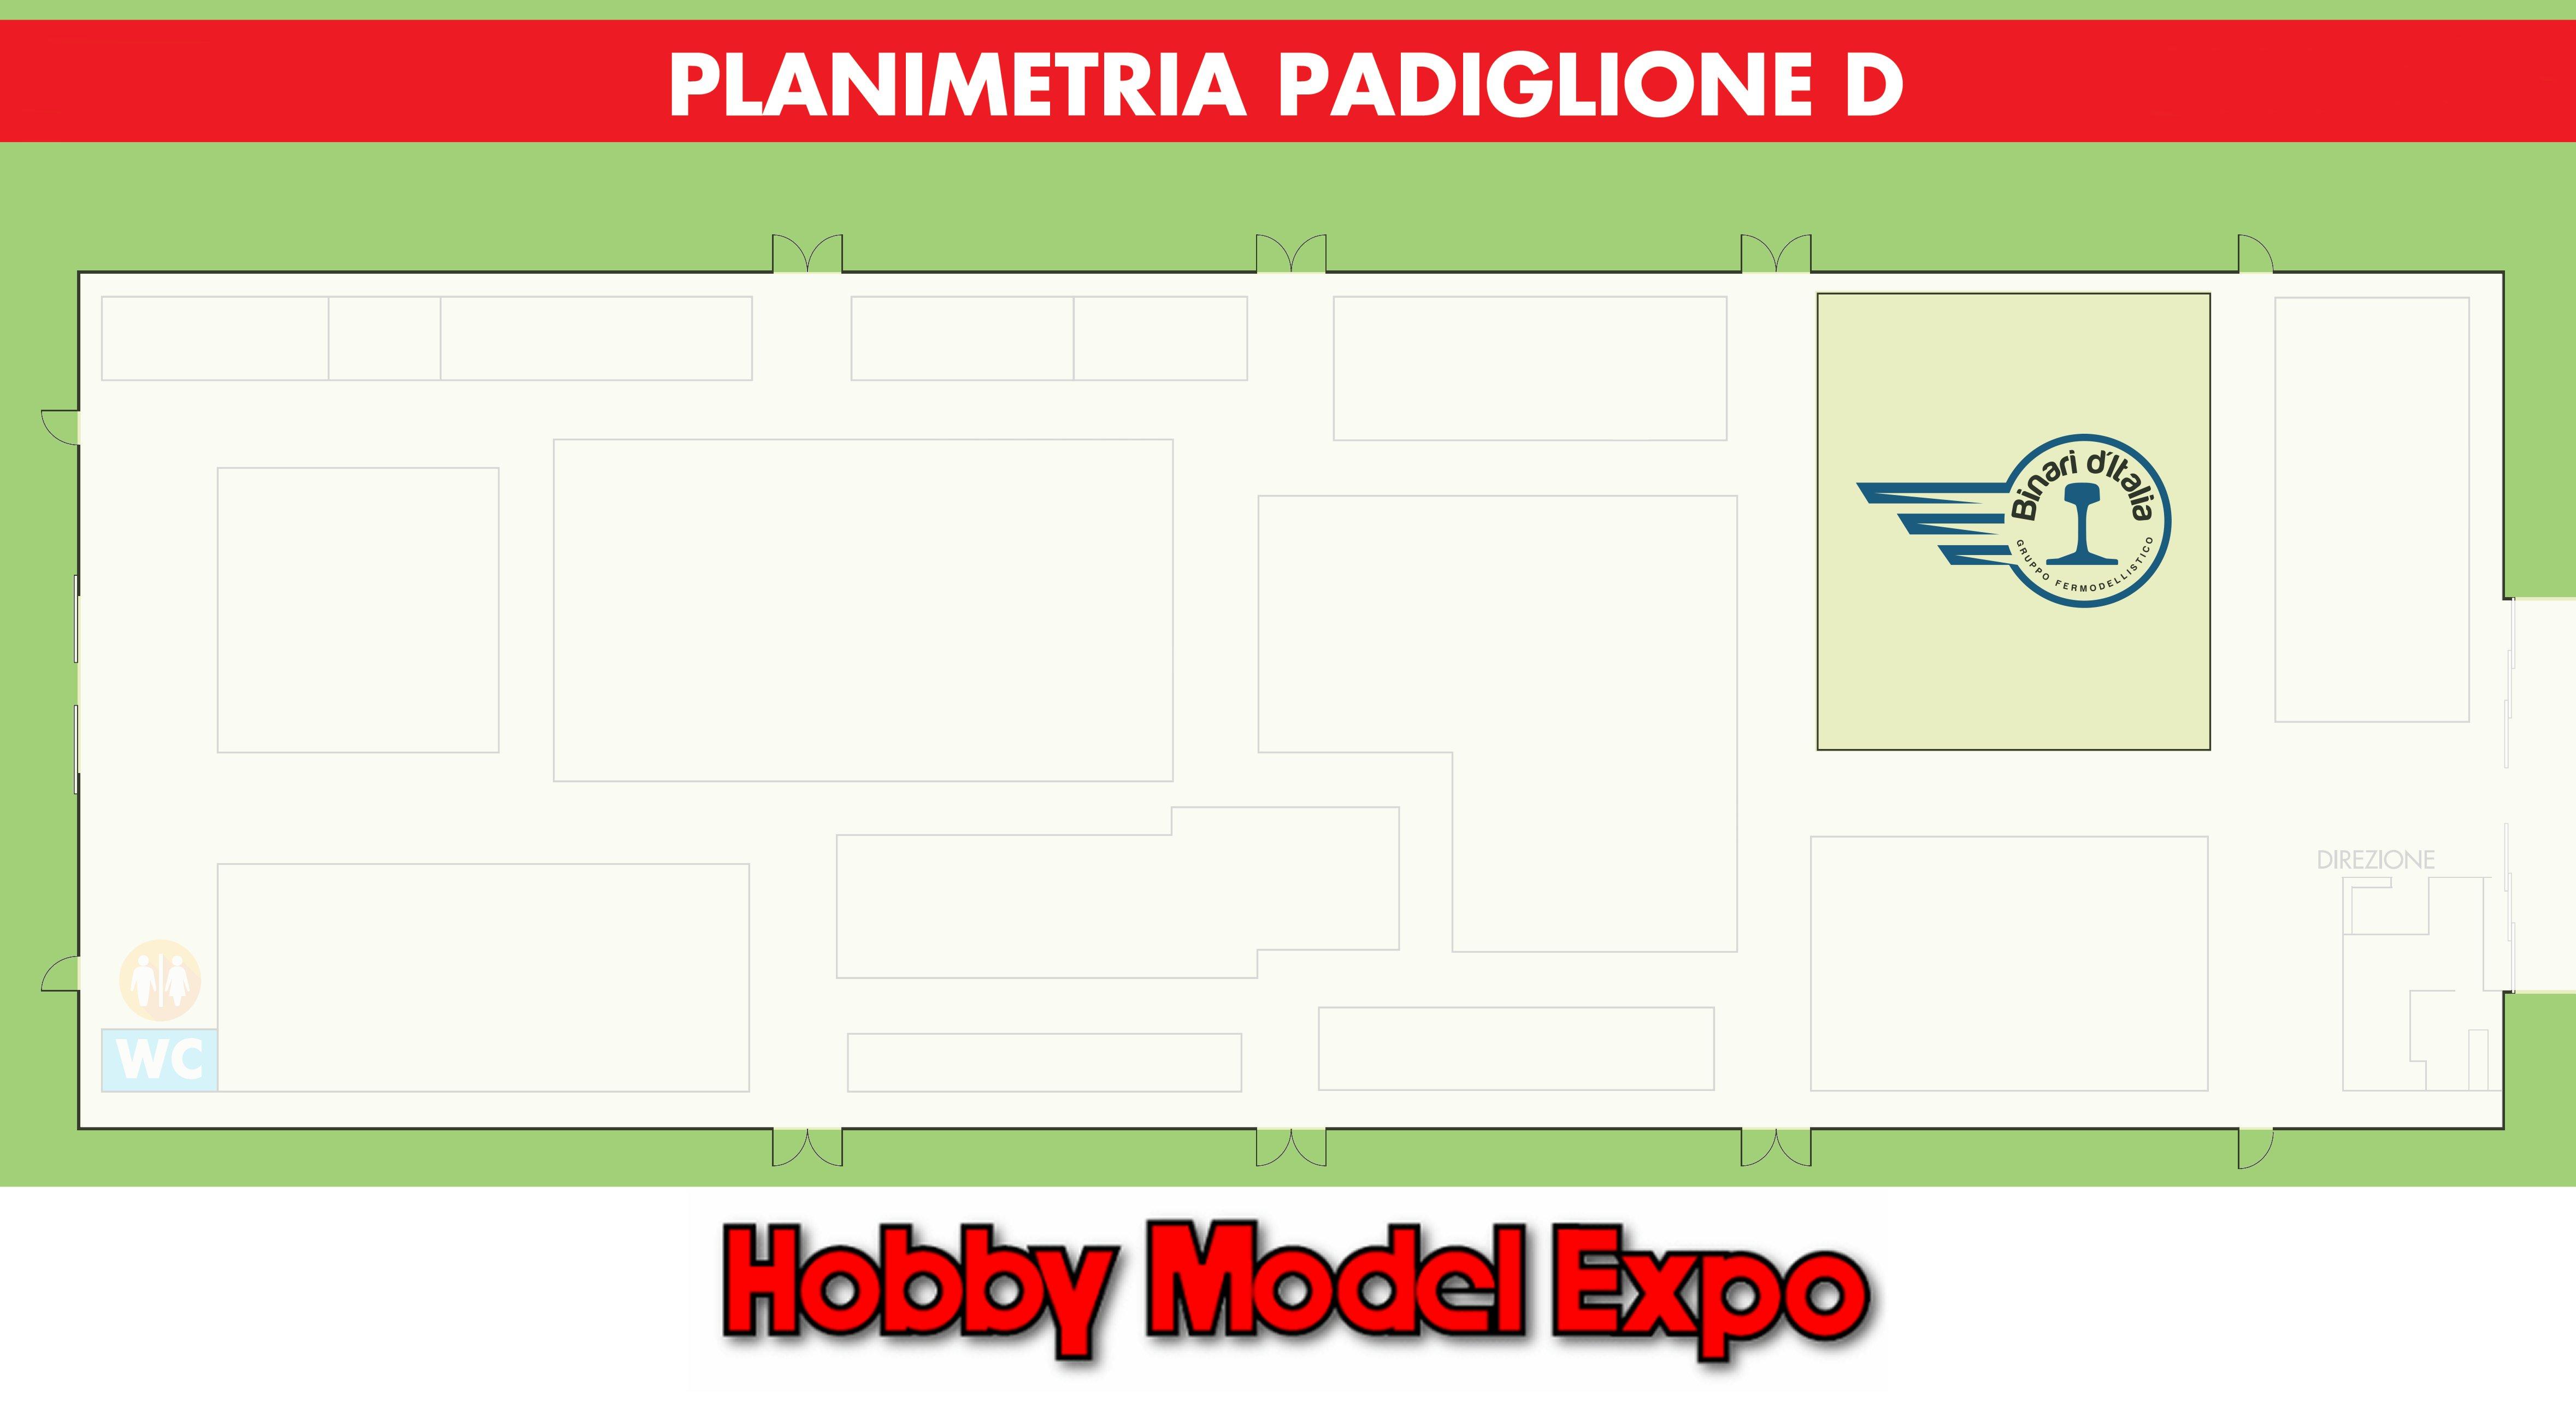 PIANTA_PAD_HME_19 - Pad D